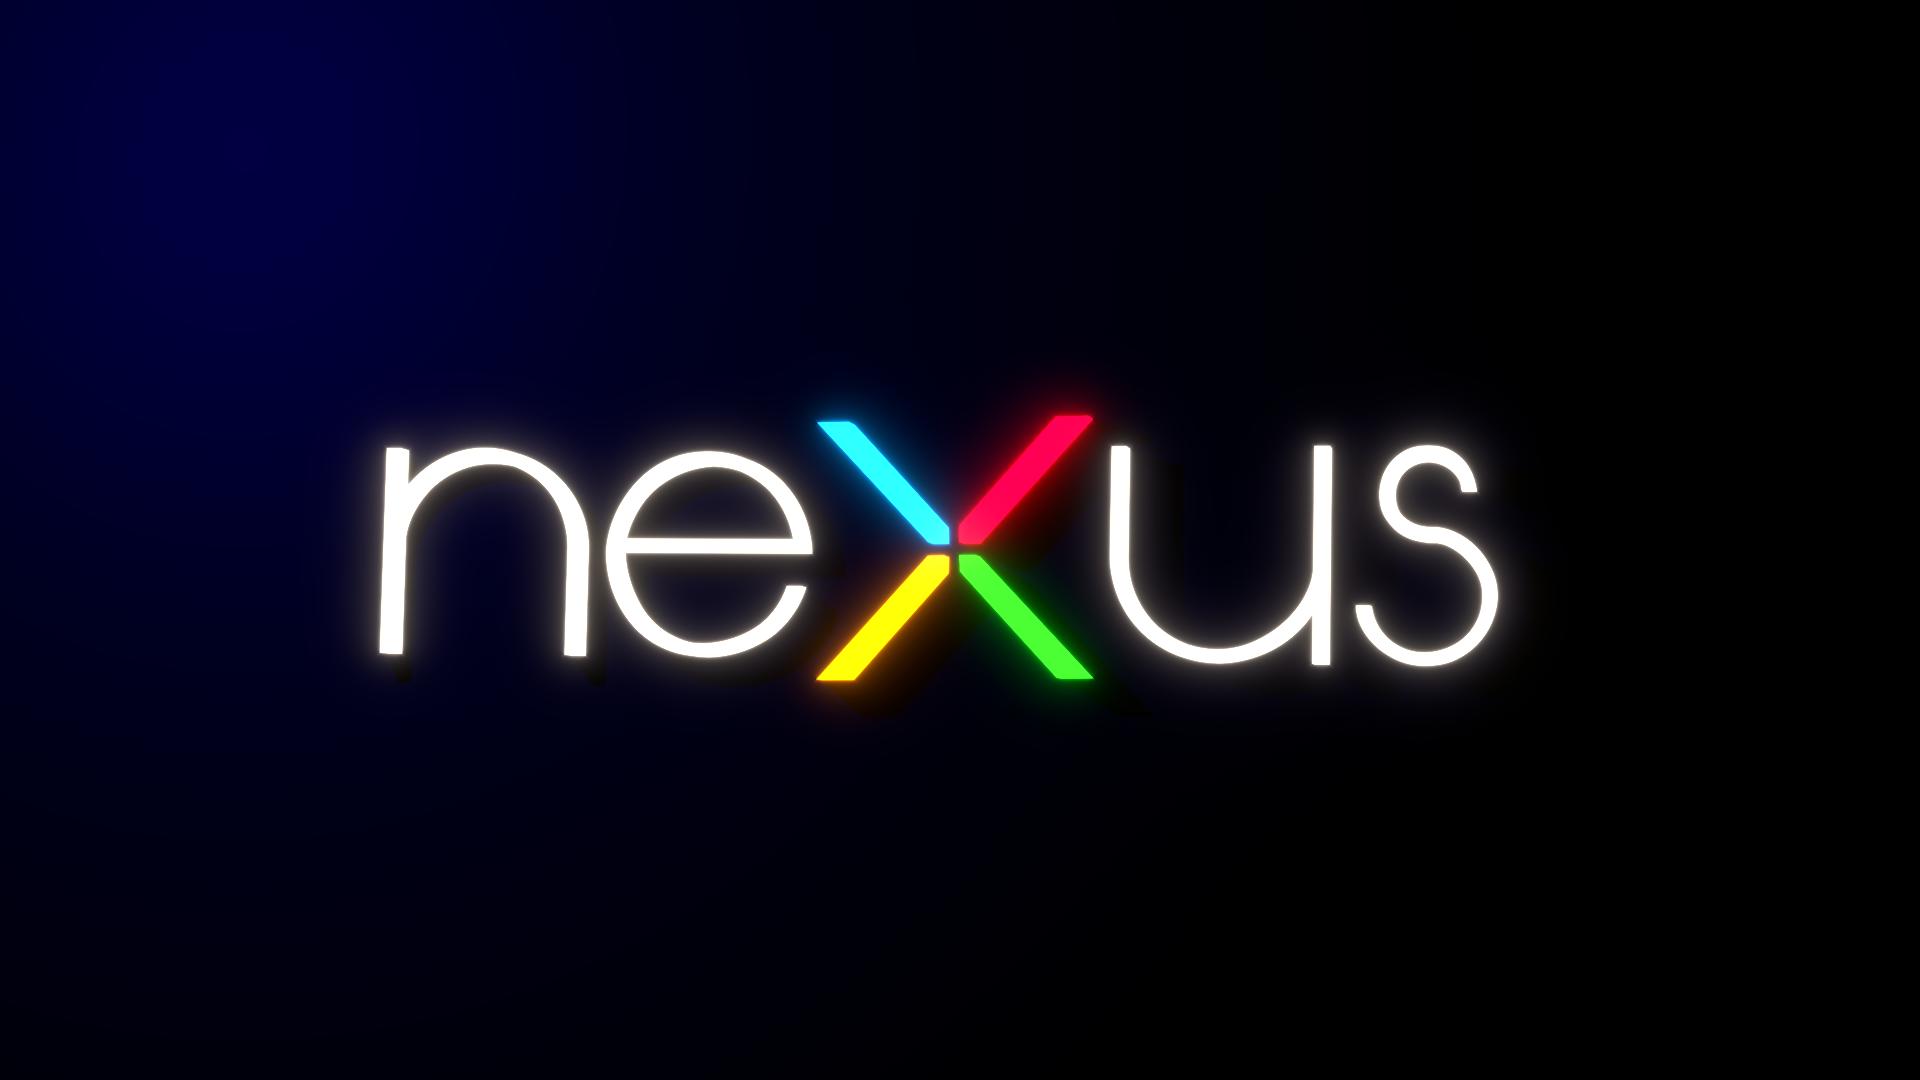 Google I/O Nexus logo